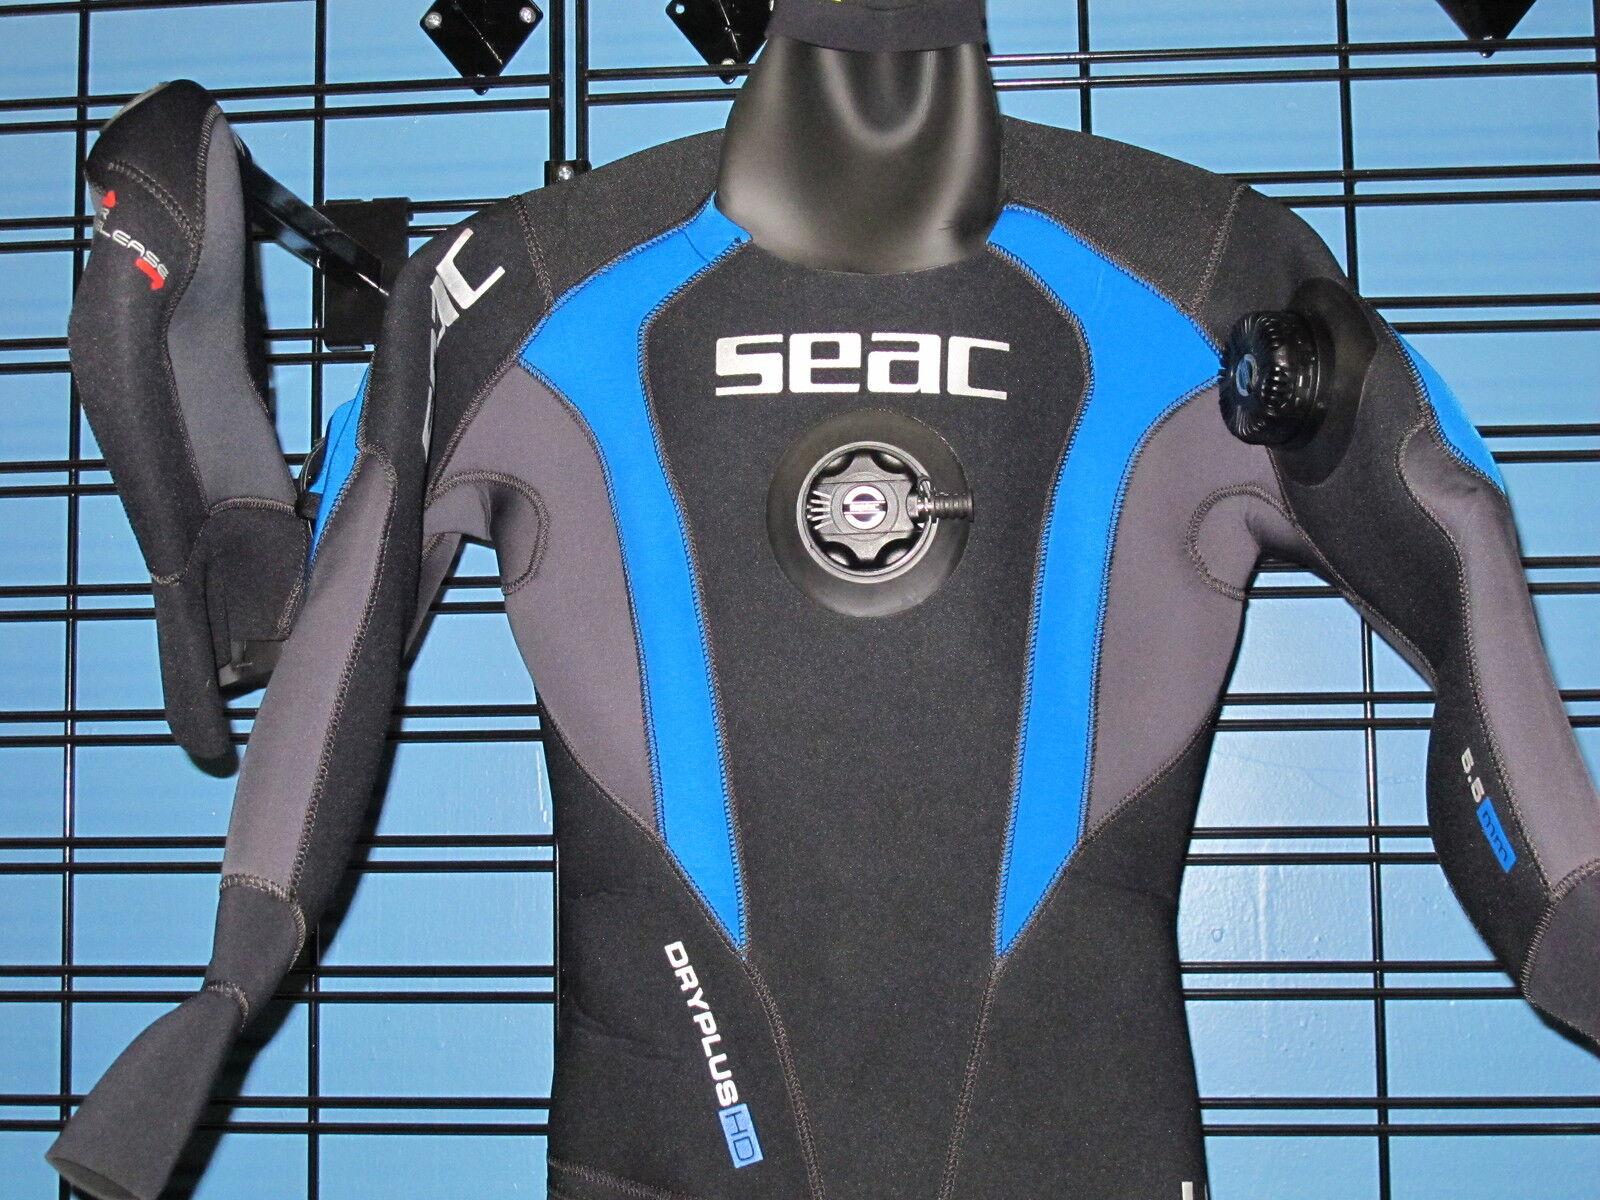 Seac  Women's Dry-Plus scuba diving drysuit size M  is discounted